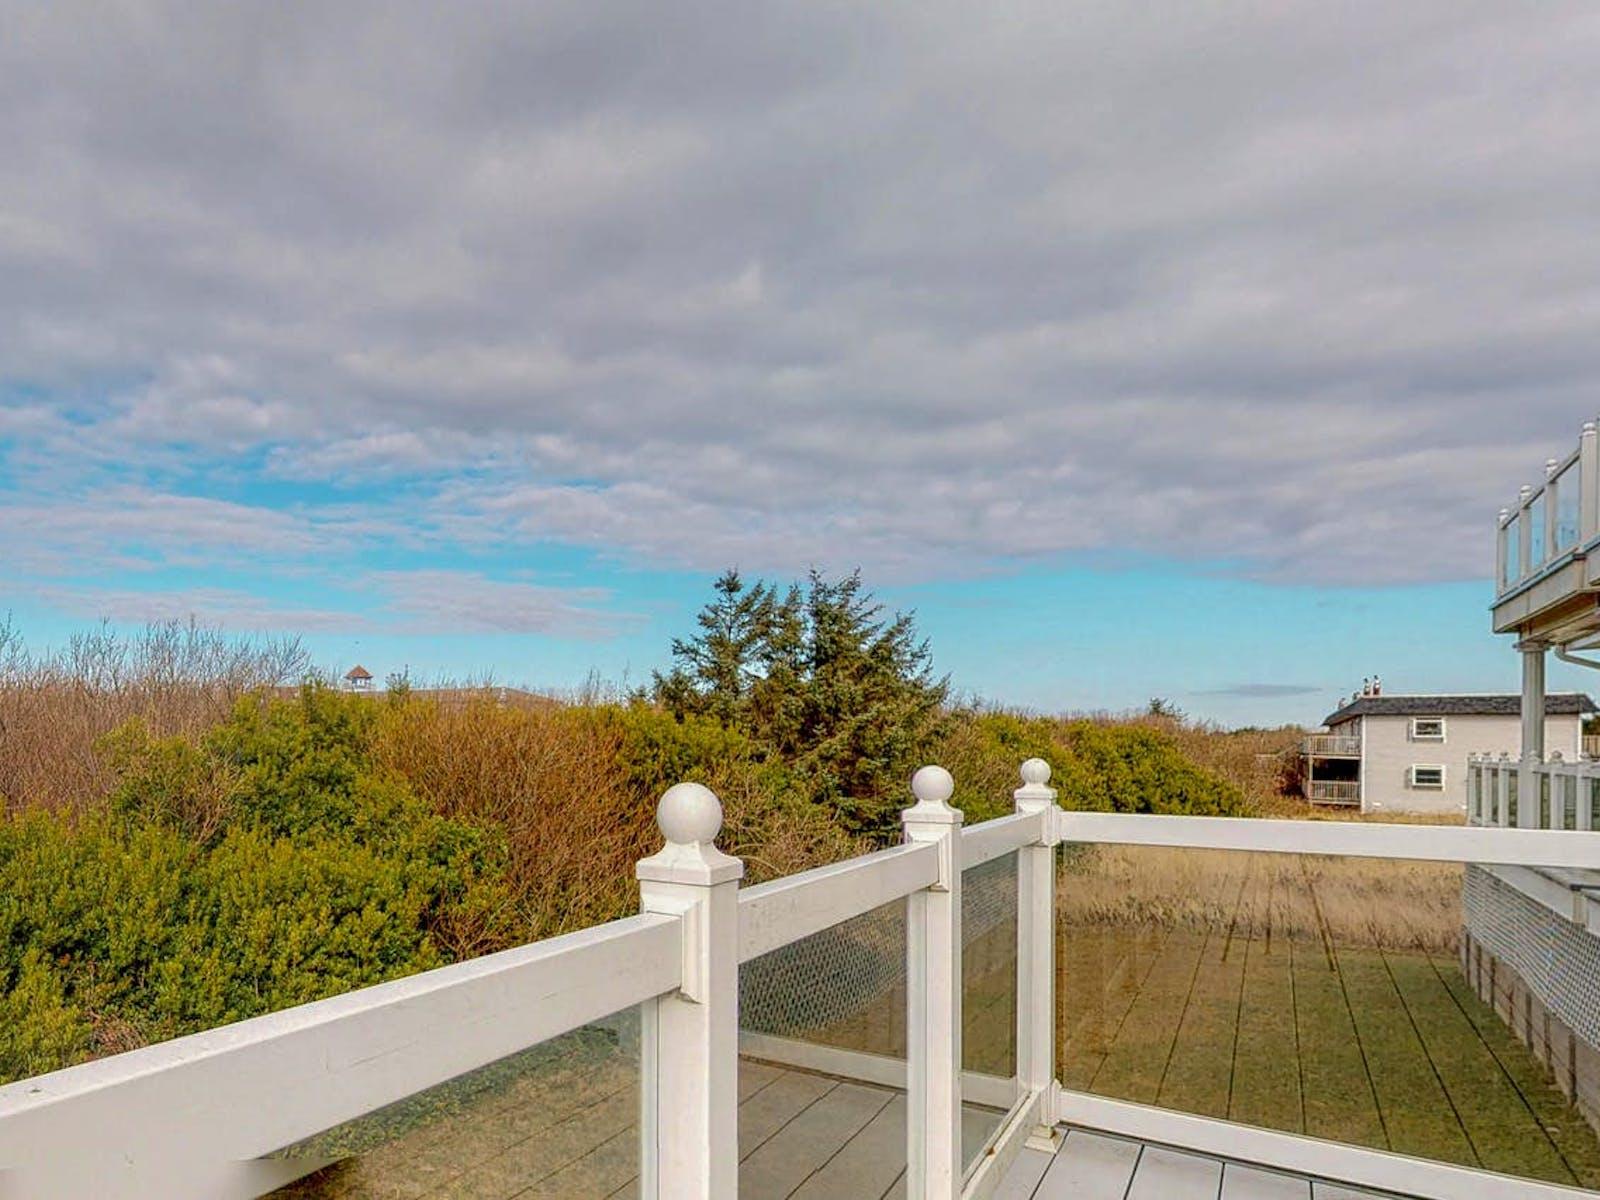 View from balcony of Judith Ann Inn